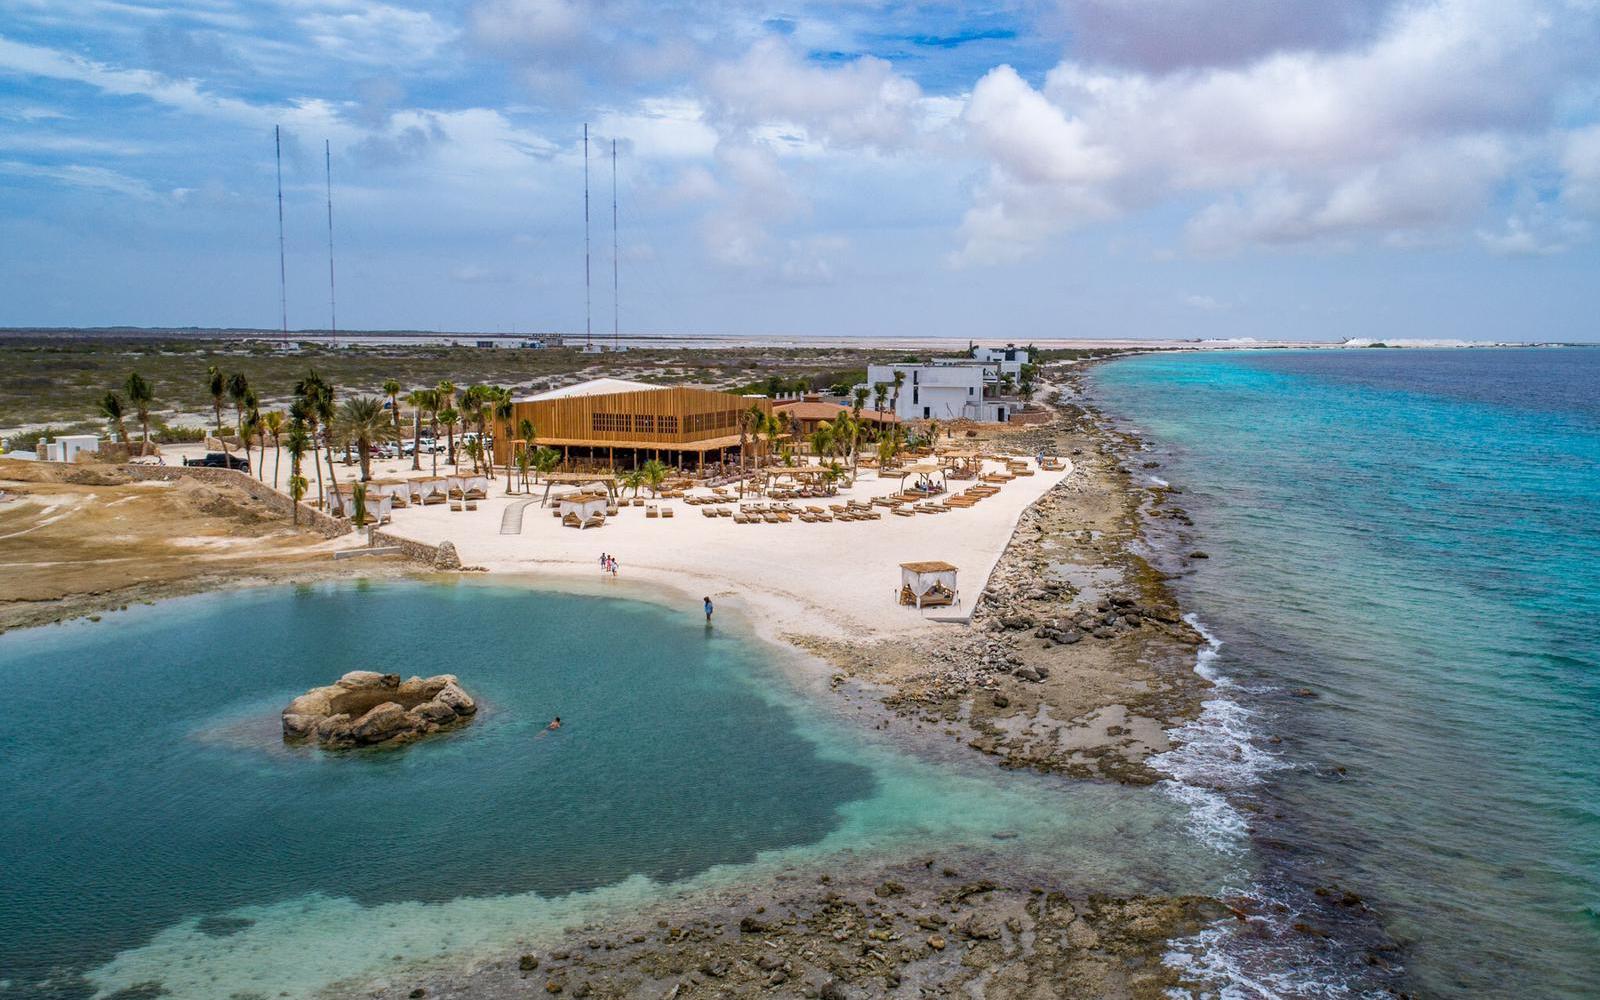 Bonaire strandpaviljoen Ocean Oasis - BINT architecten